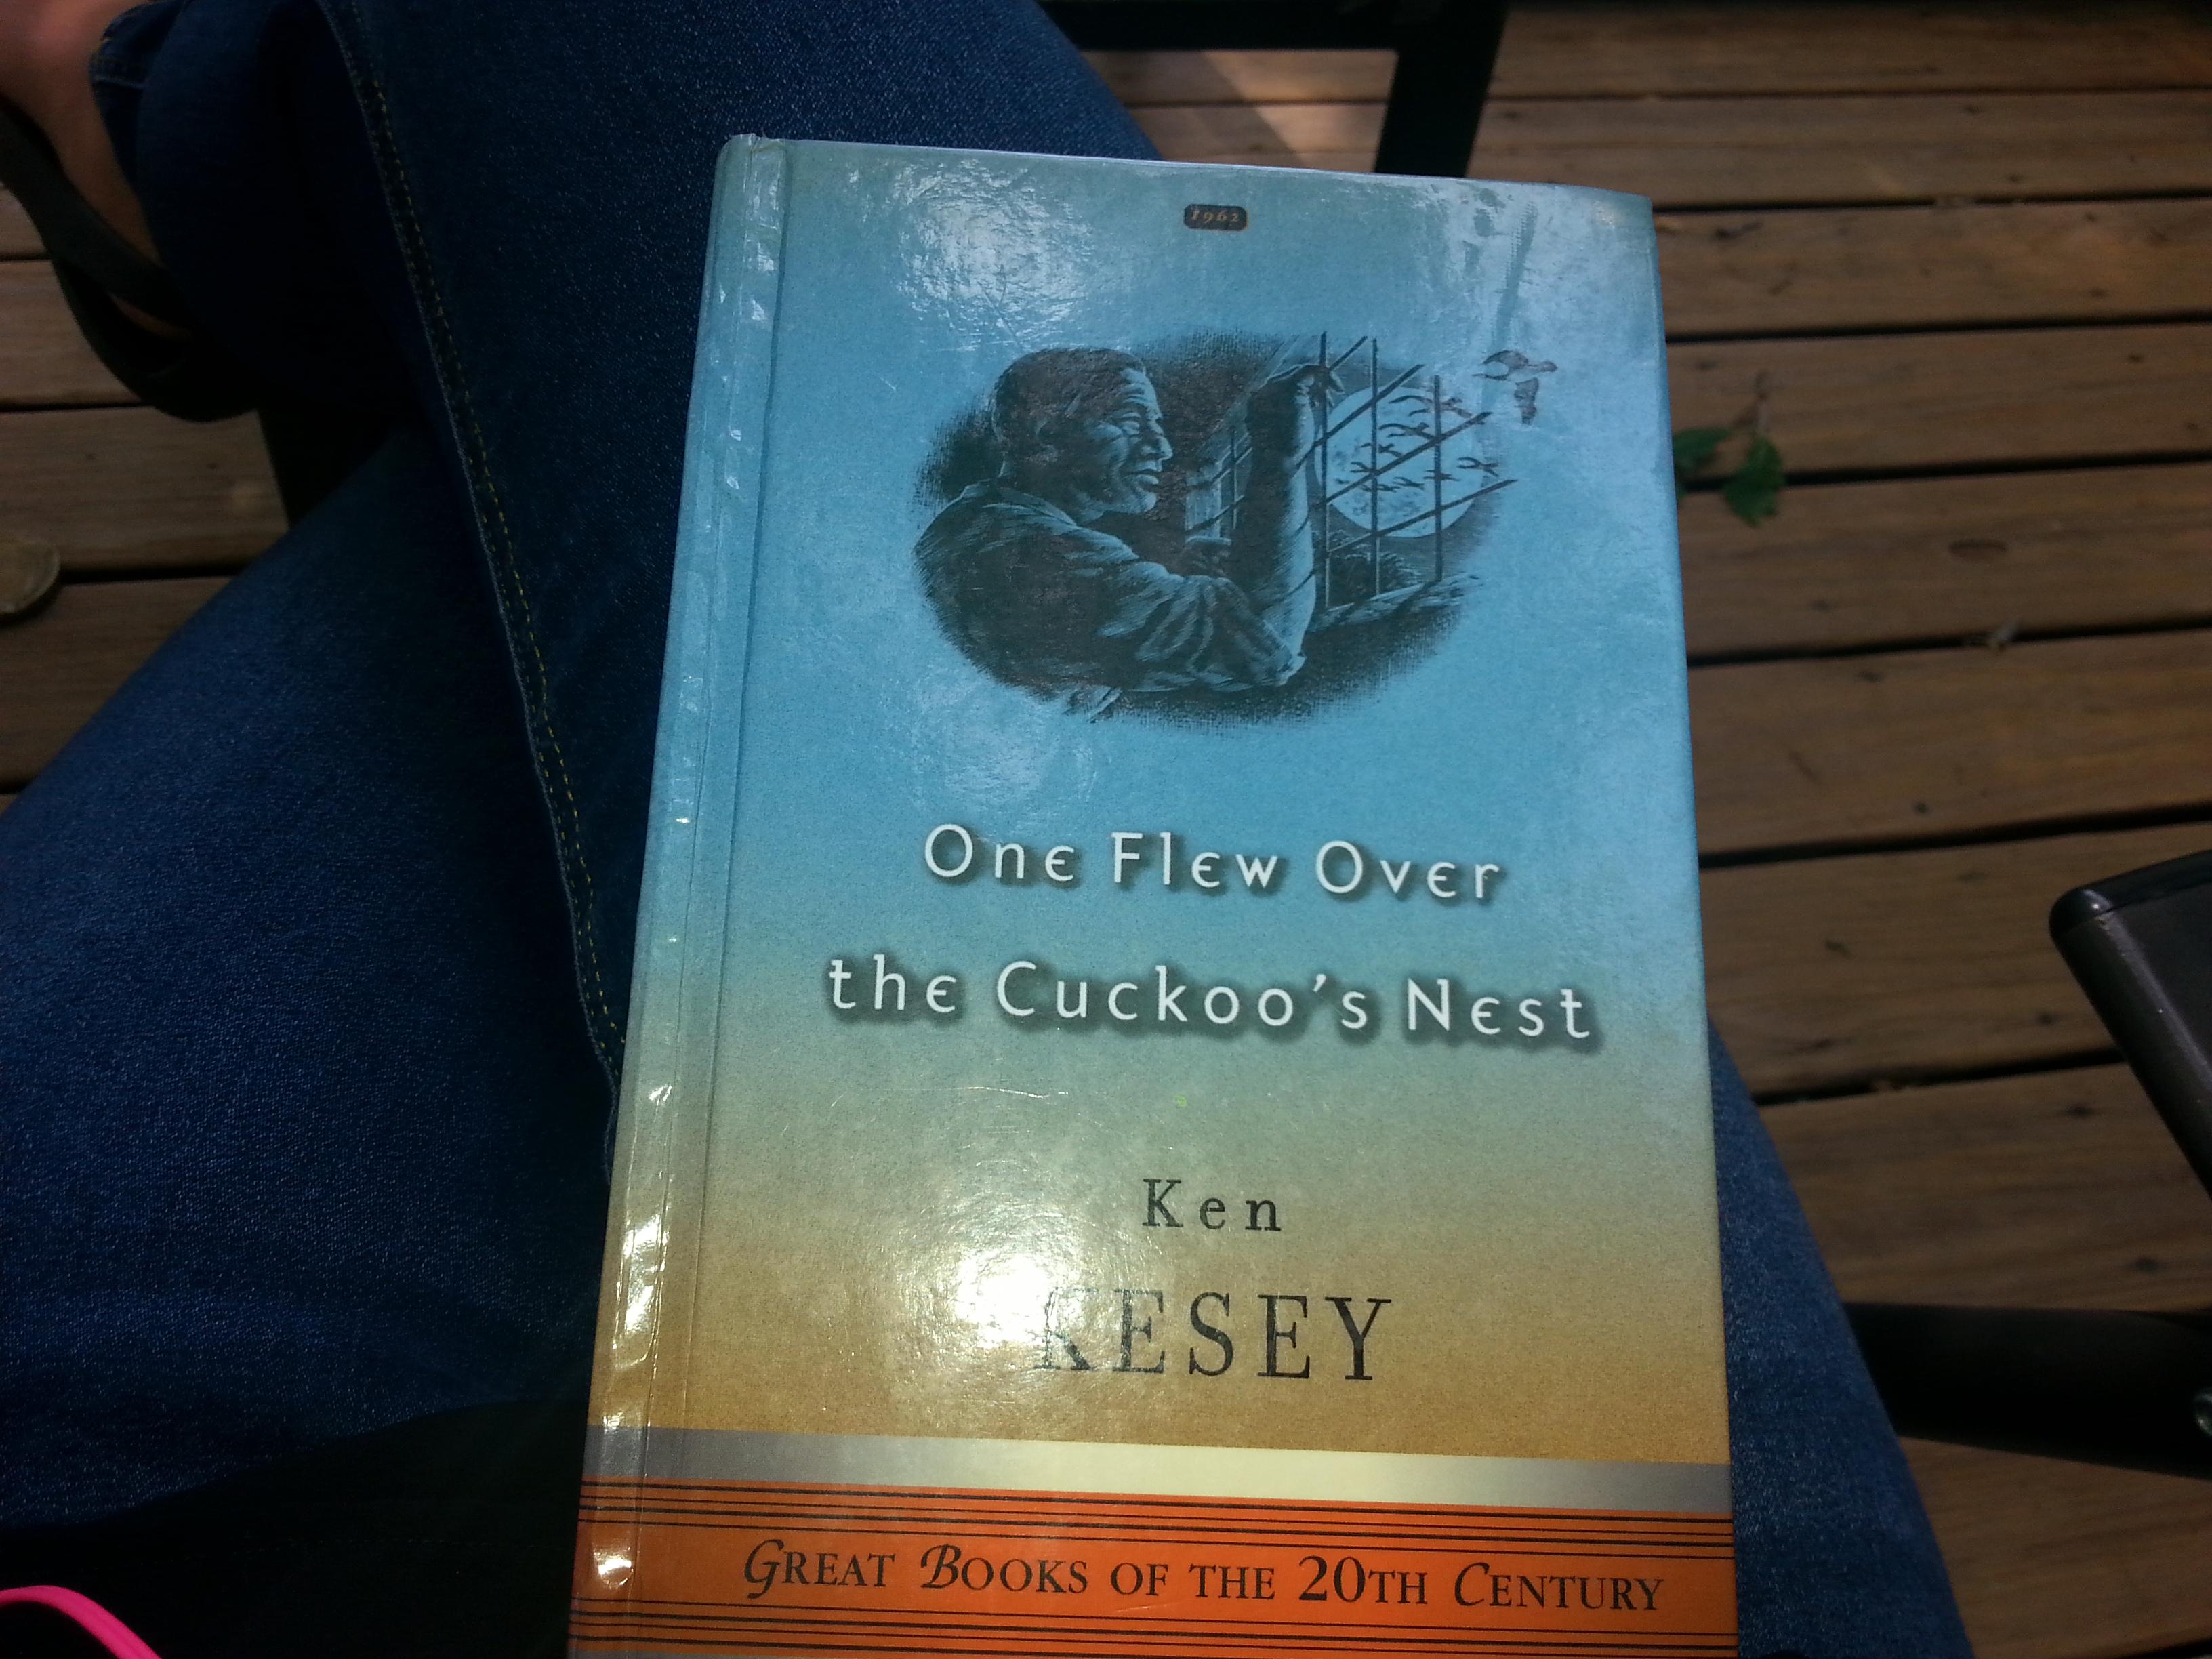 Ken Keseys One Flew Over the Cuckos Nest